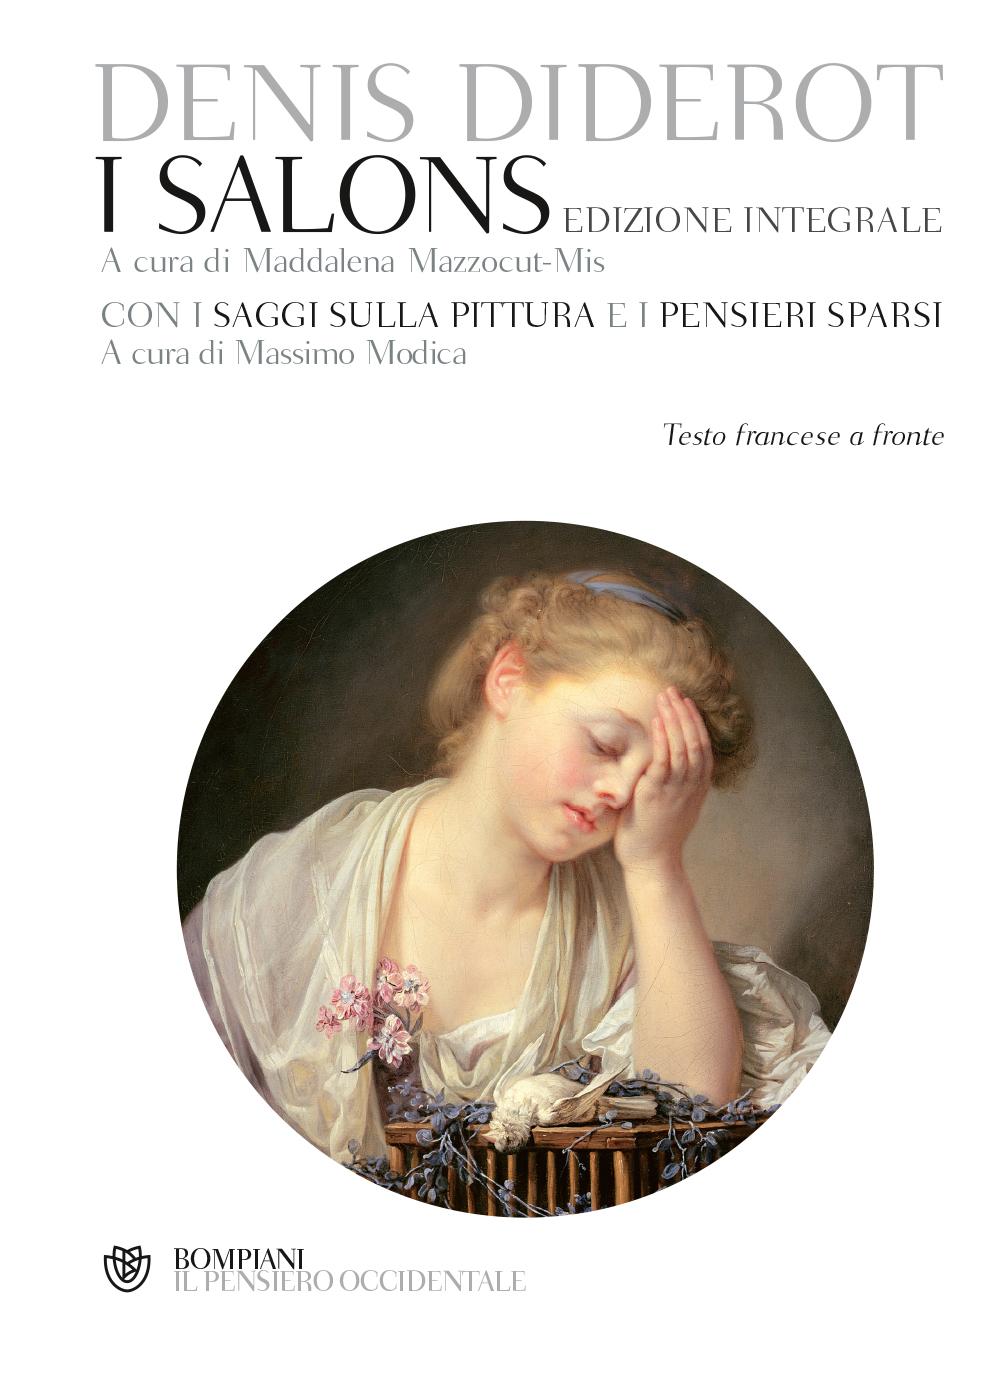 I Salons